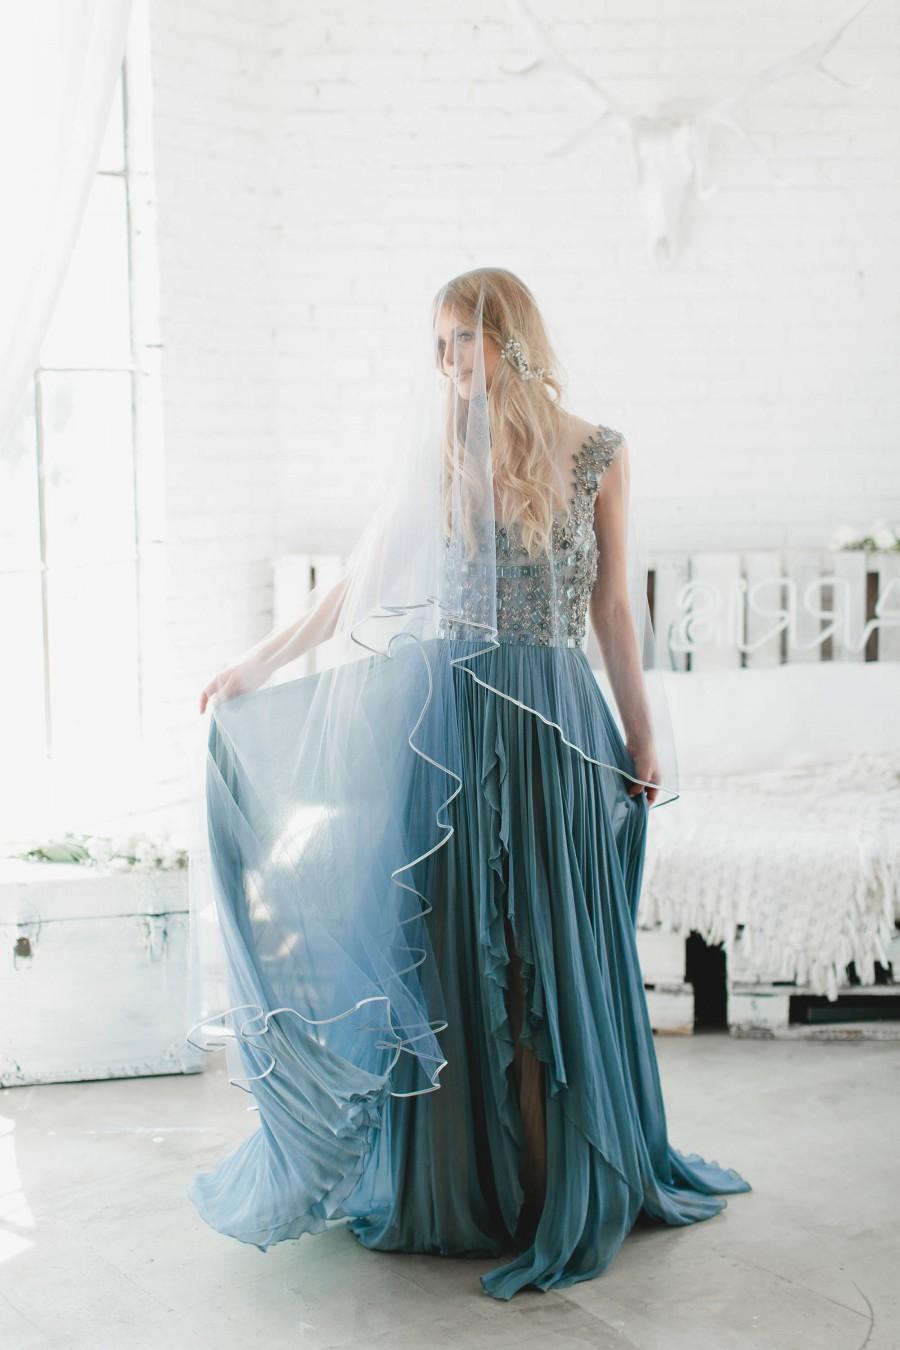 Wedding - Wedding Veil, Drop Veil, Bridal Veil, Blue Ombre' Veil, Two Tier Veil, Pencil Edge Veil Hand Dyed Veil Fingertip Length Cathedral Veil, 1711